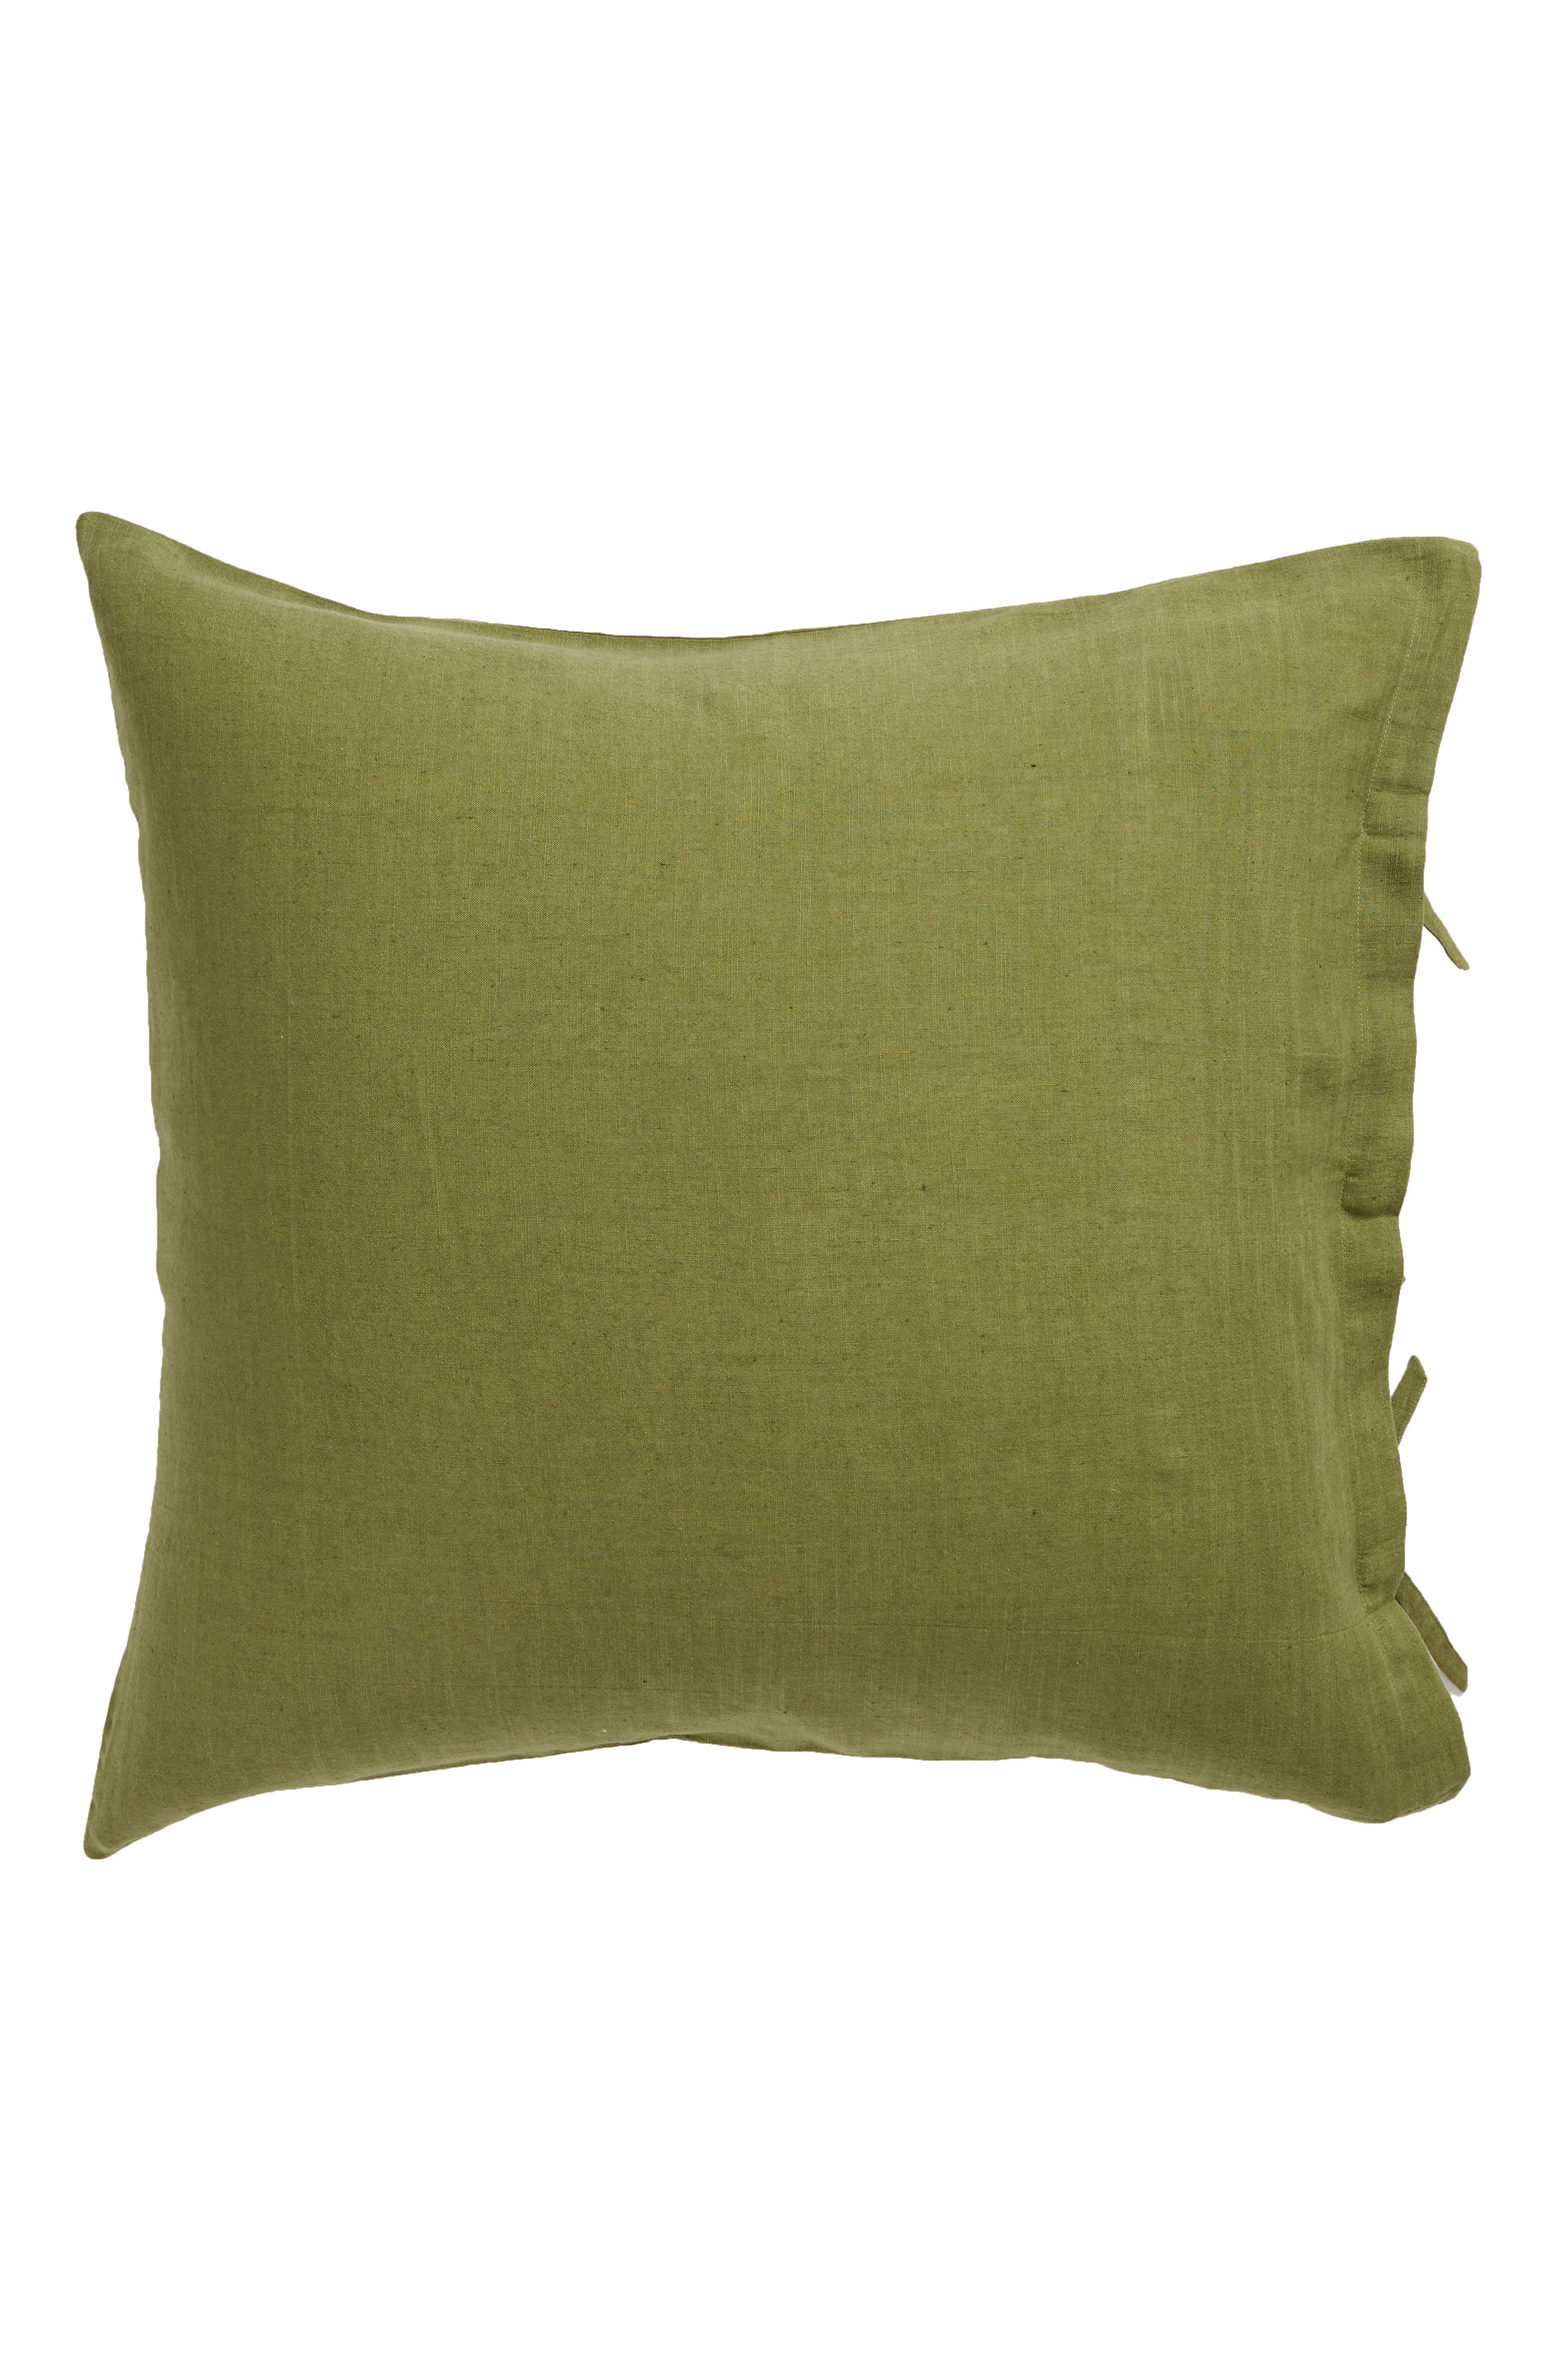 TREASURE & BOND Relaxed Cotton & Linen Euro Sham, Main, color, OLIVE SPICE